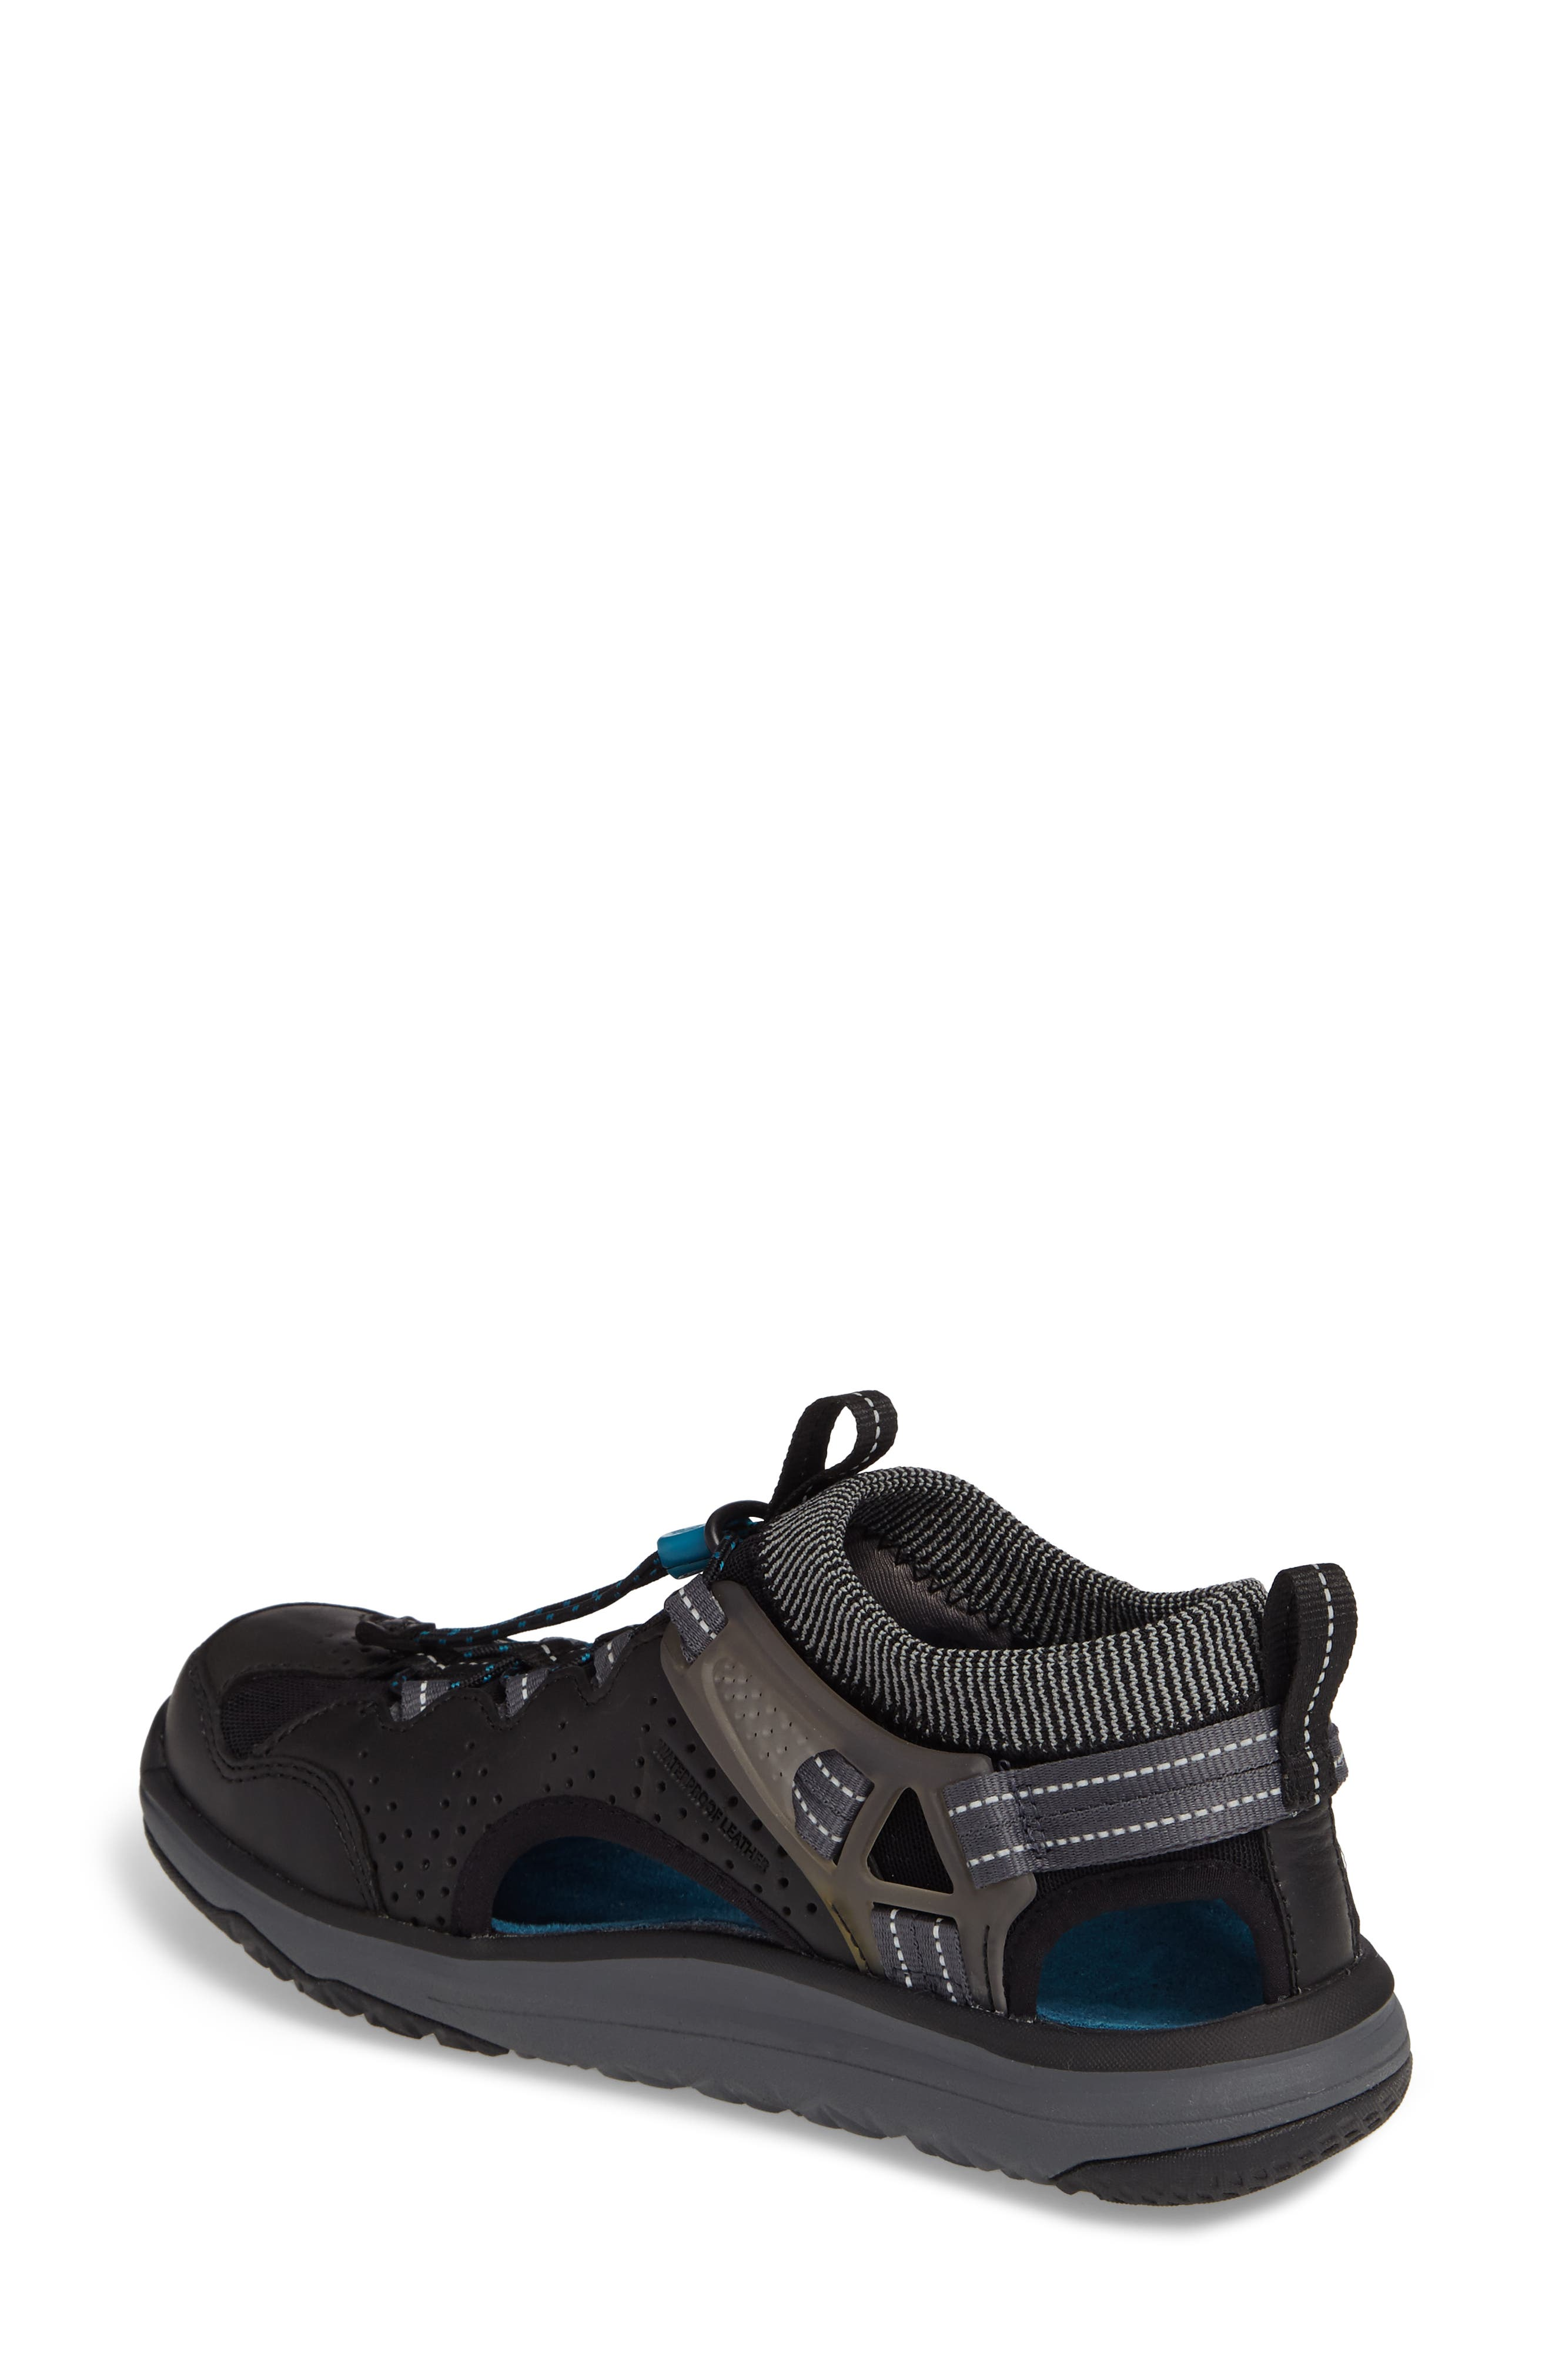 Terra Float Travel Sandal,                             Alternate thumbnail 2, color,                             Black Leather